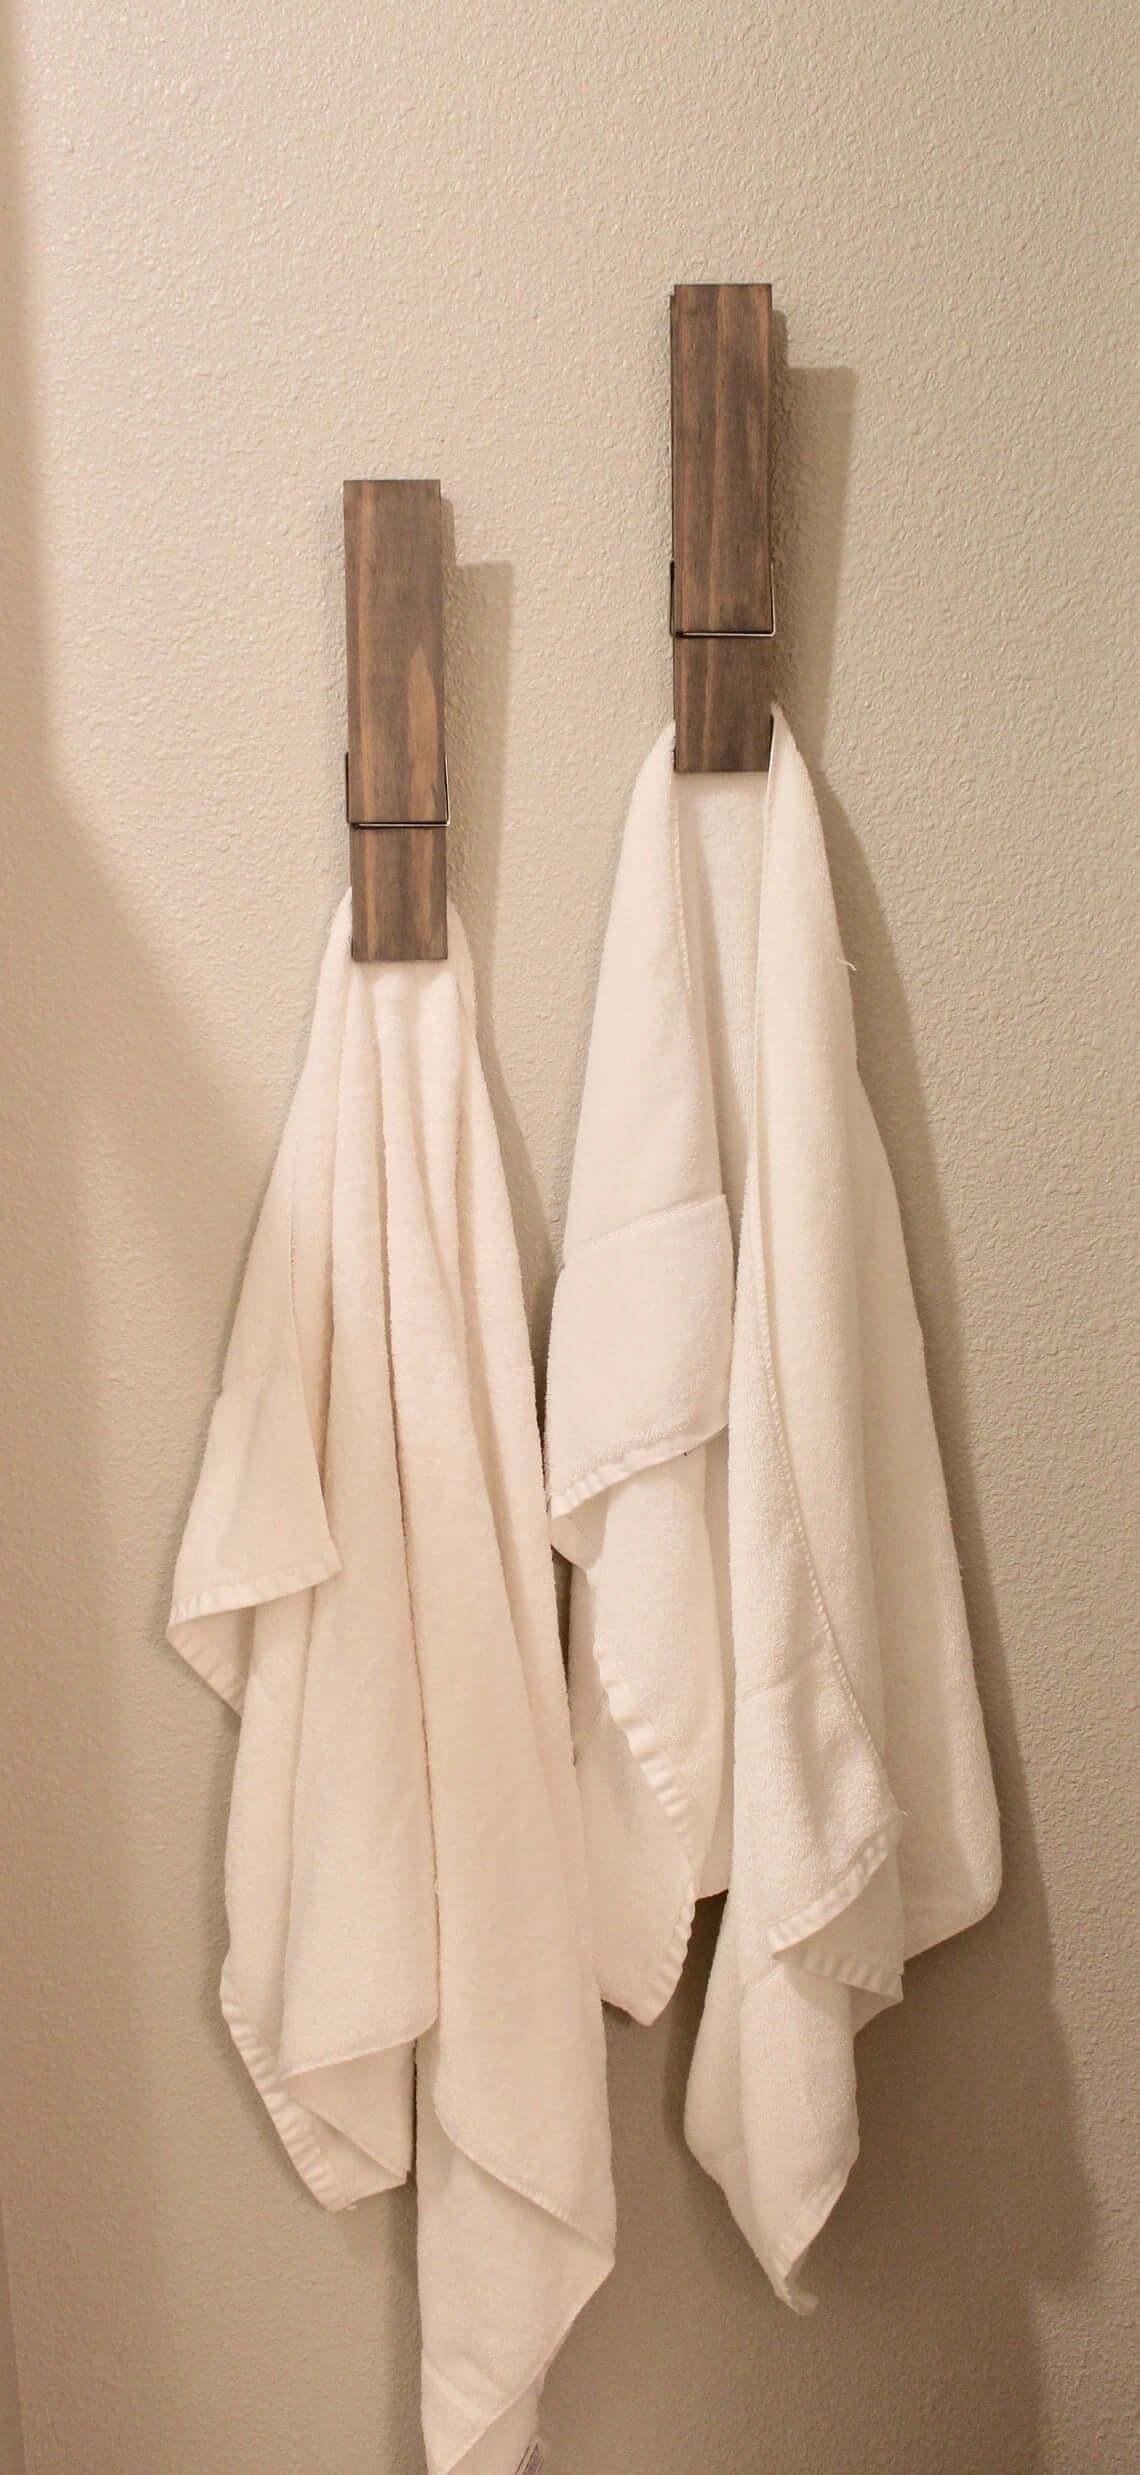 Oversized Clothespin Bathroom Towel Holders